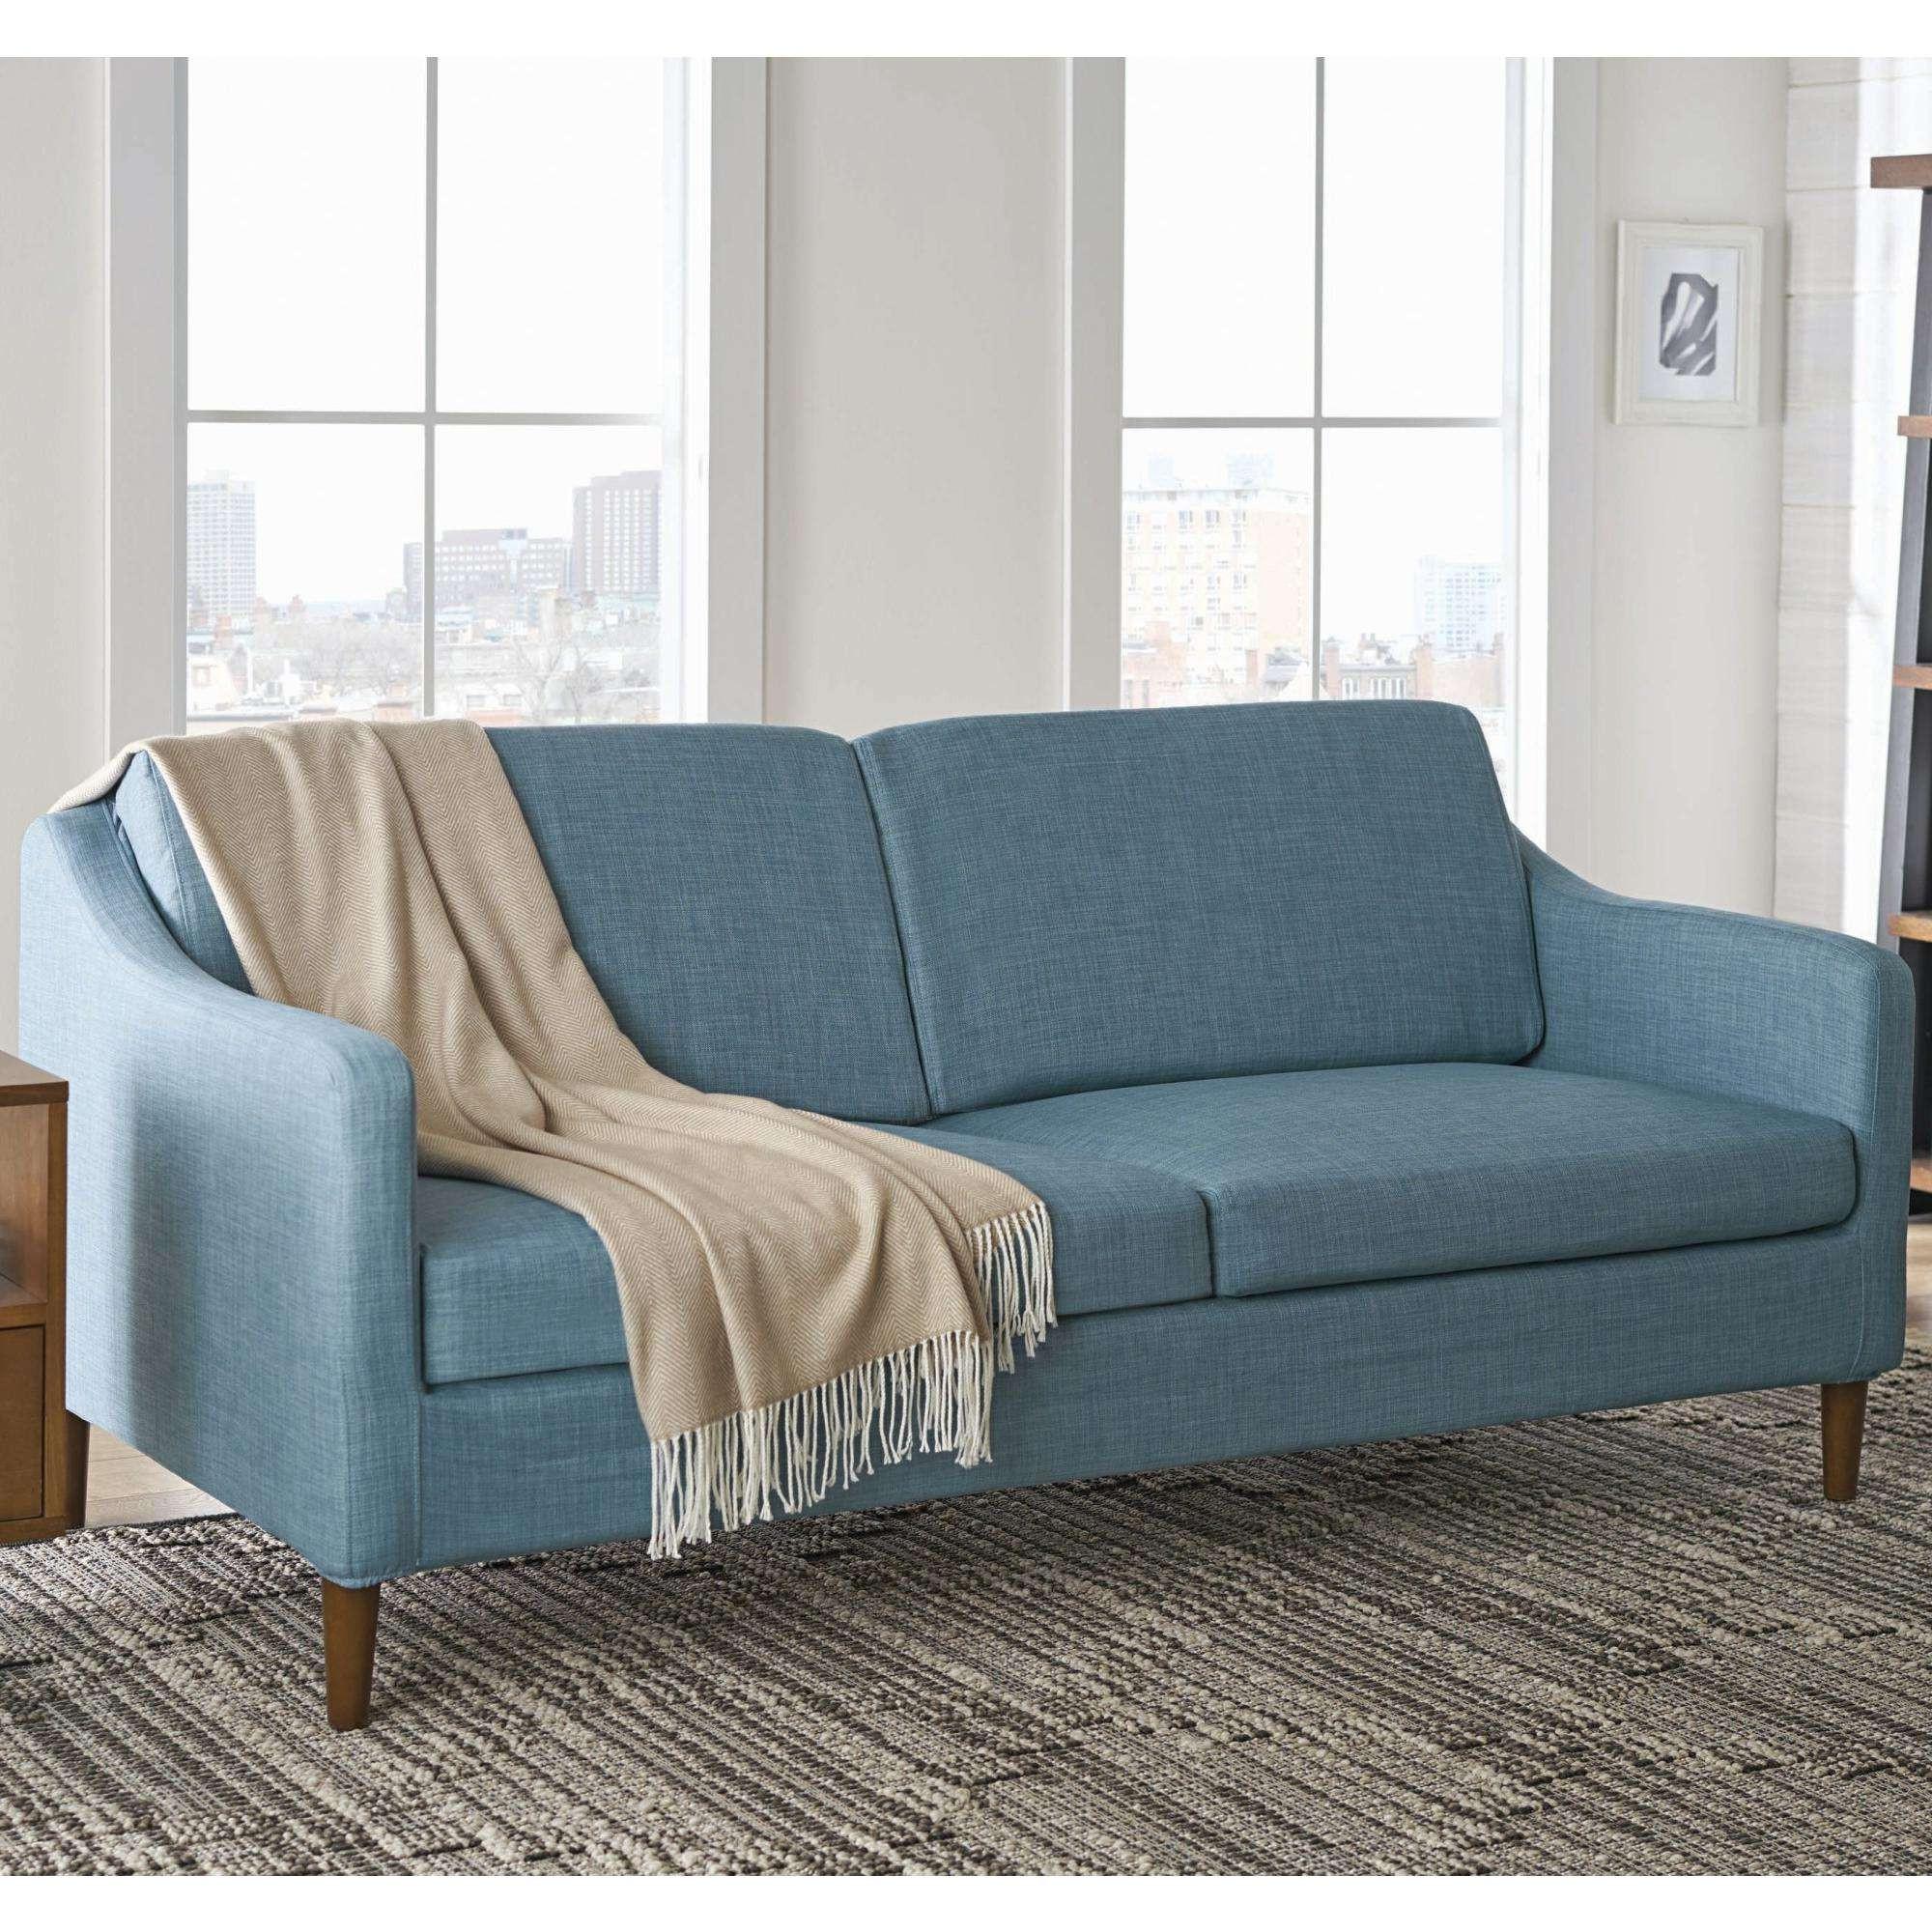 Woven Sofa Chester Sofas Corner Sofa Beige Fabric Habitat